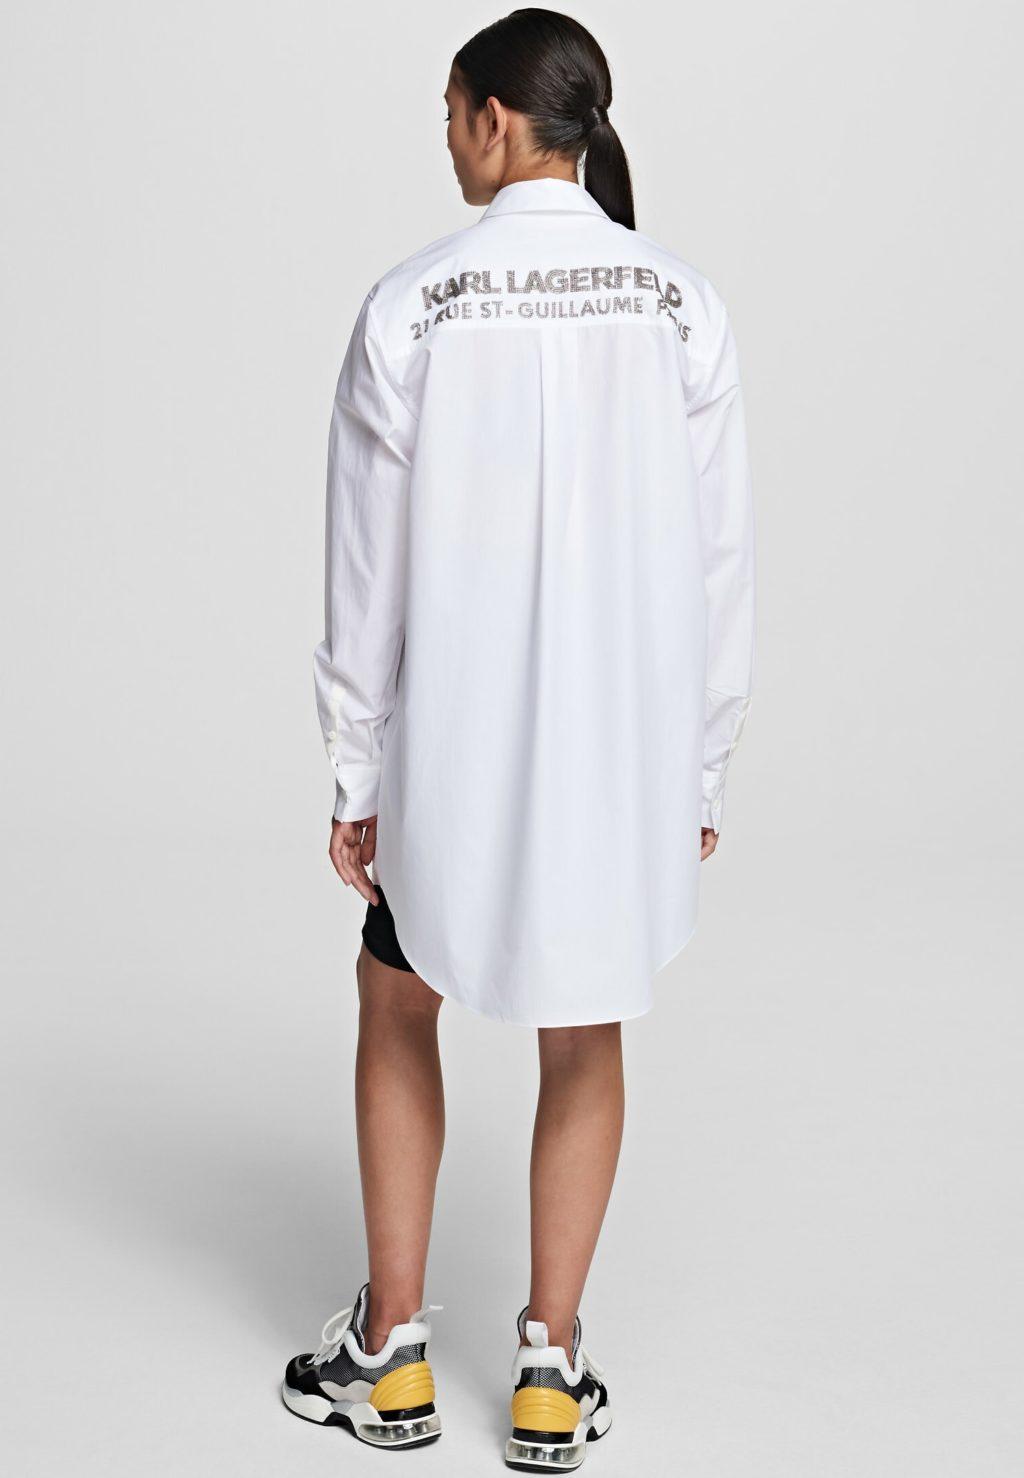 Karl Lagerfeld skjortebluse